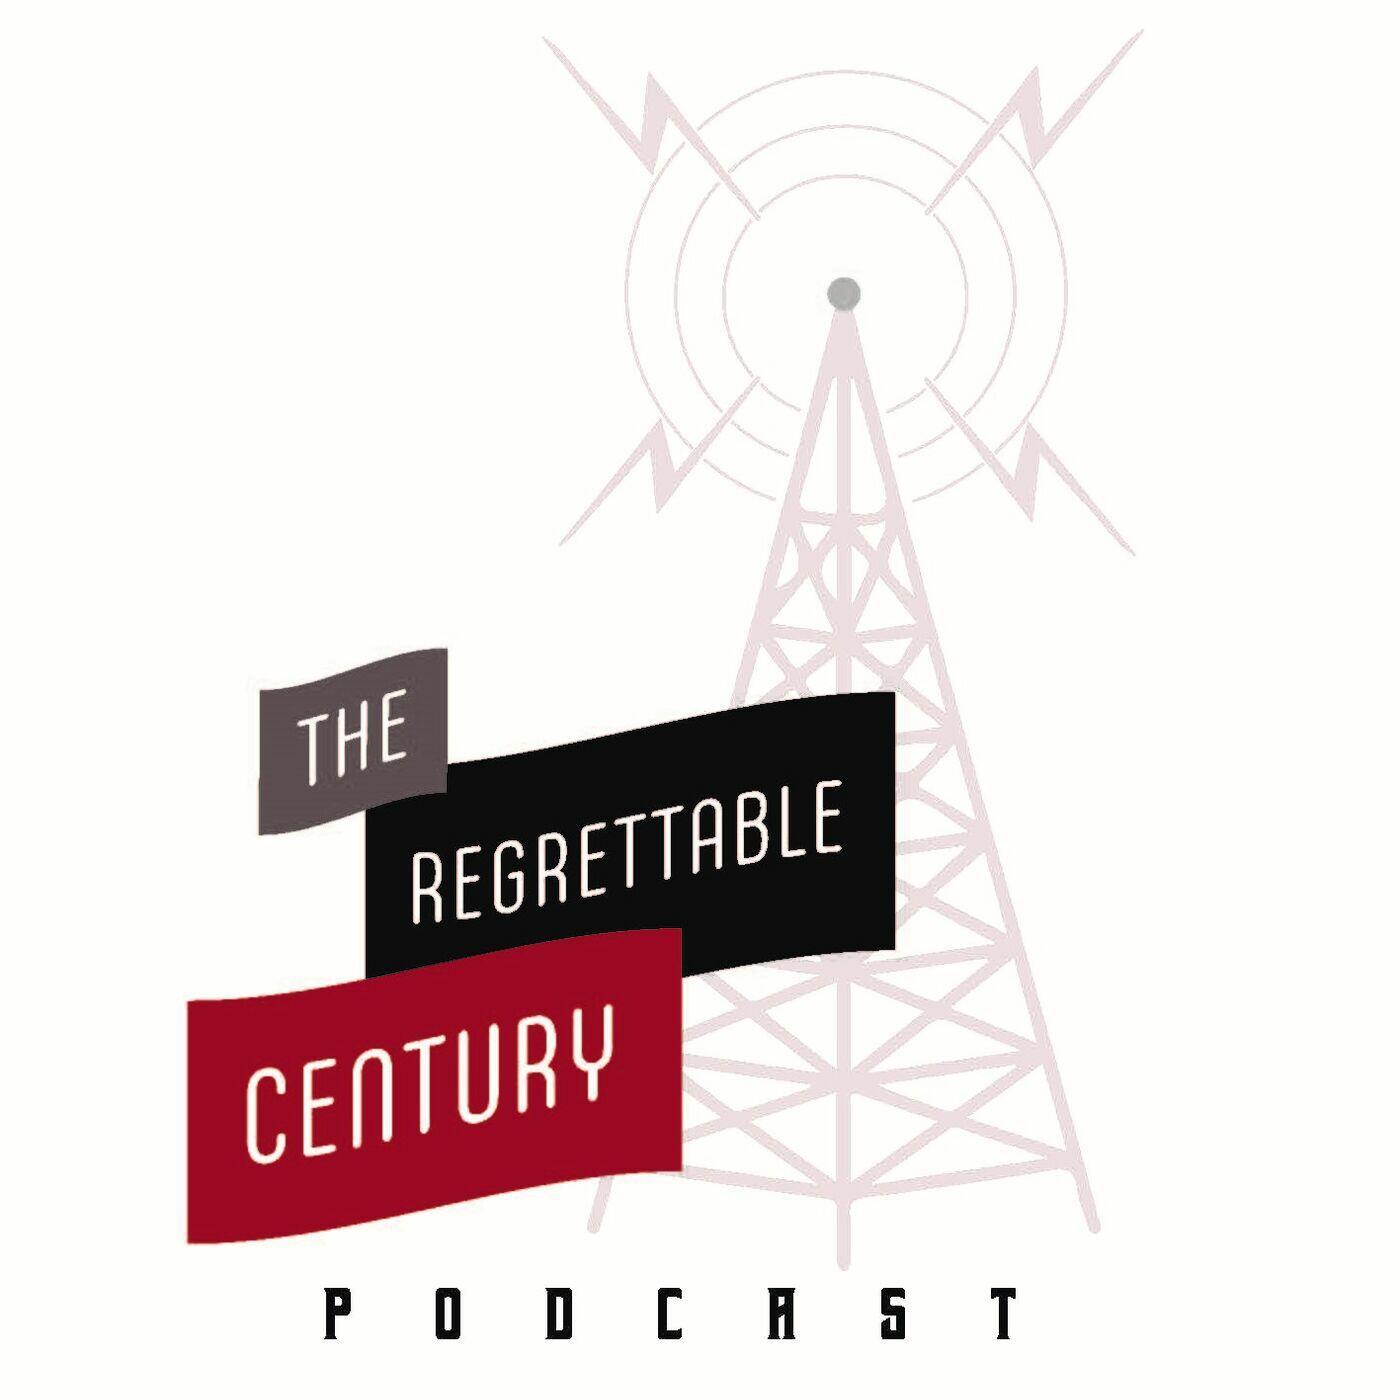 The Regrettable Century